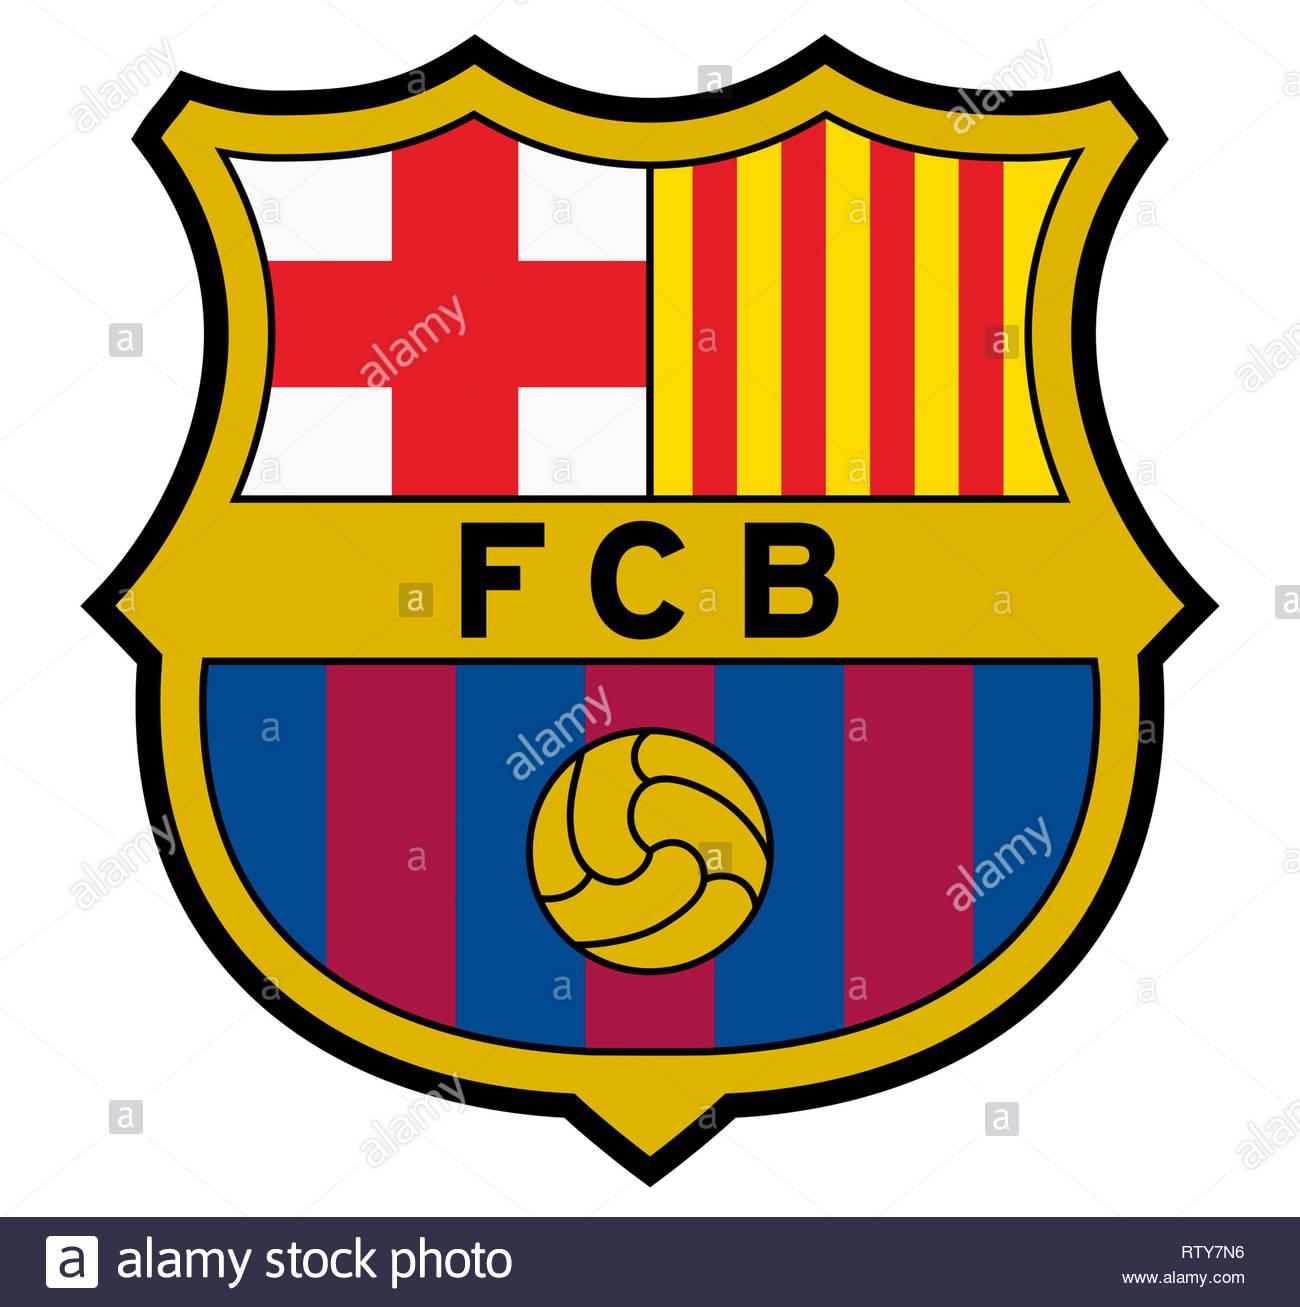 Barcelona Barca logo - Stock Image